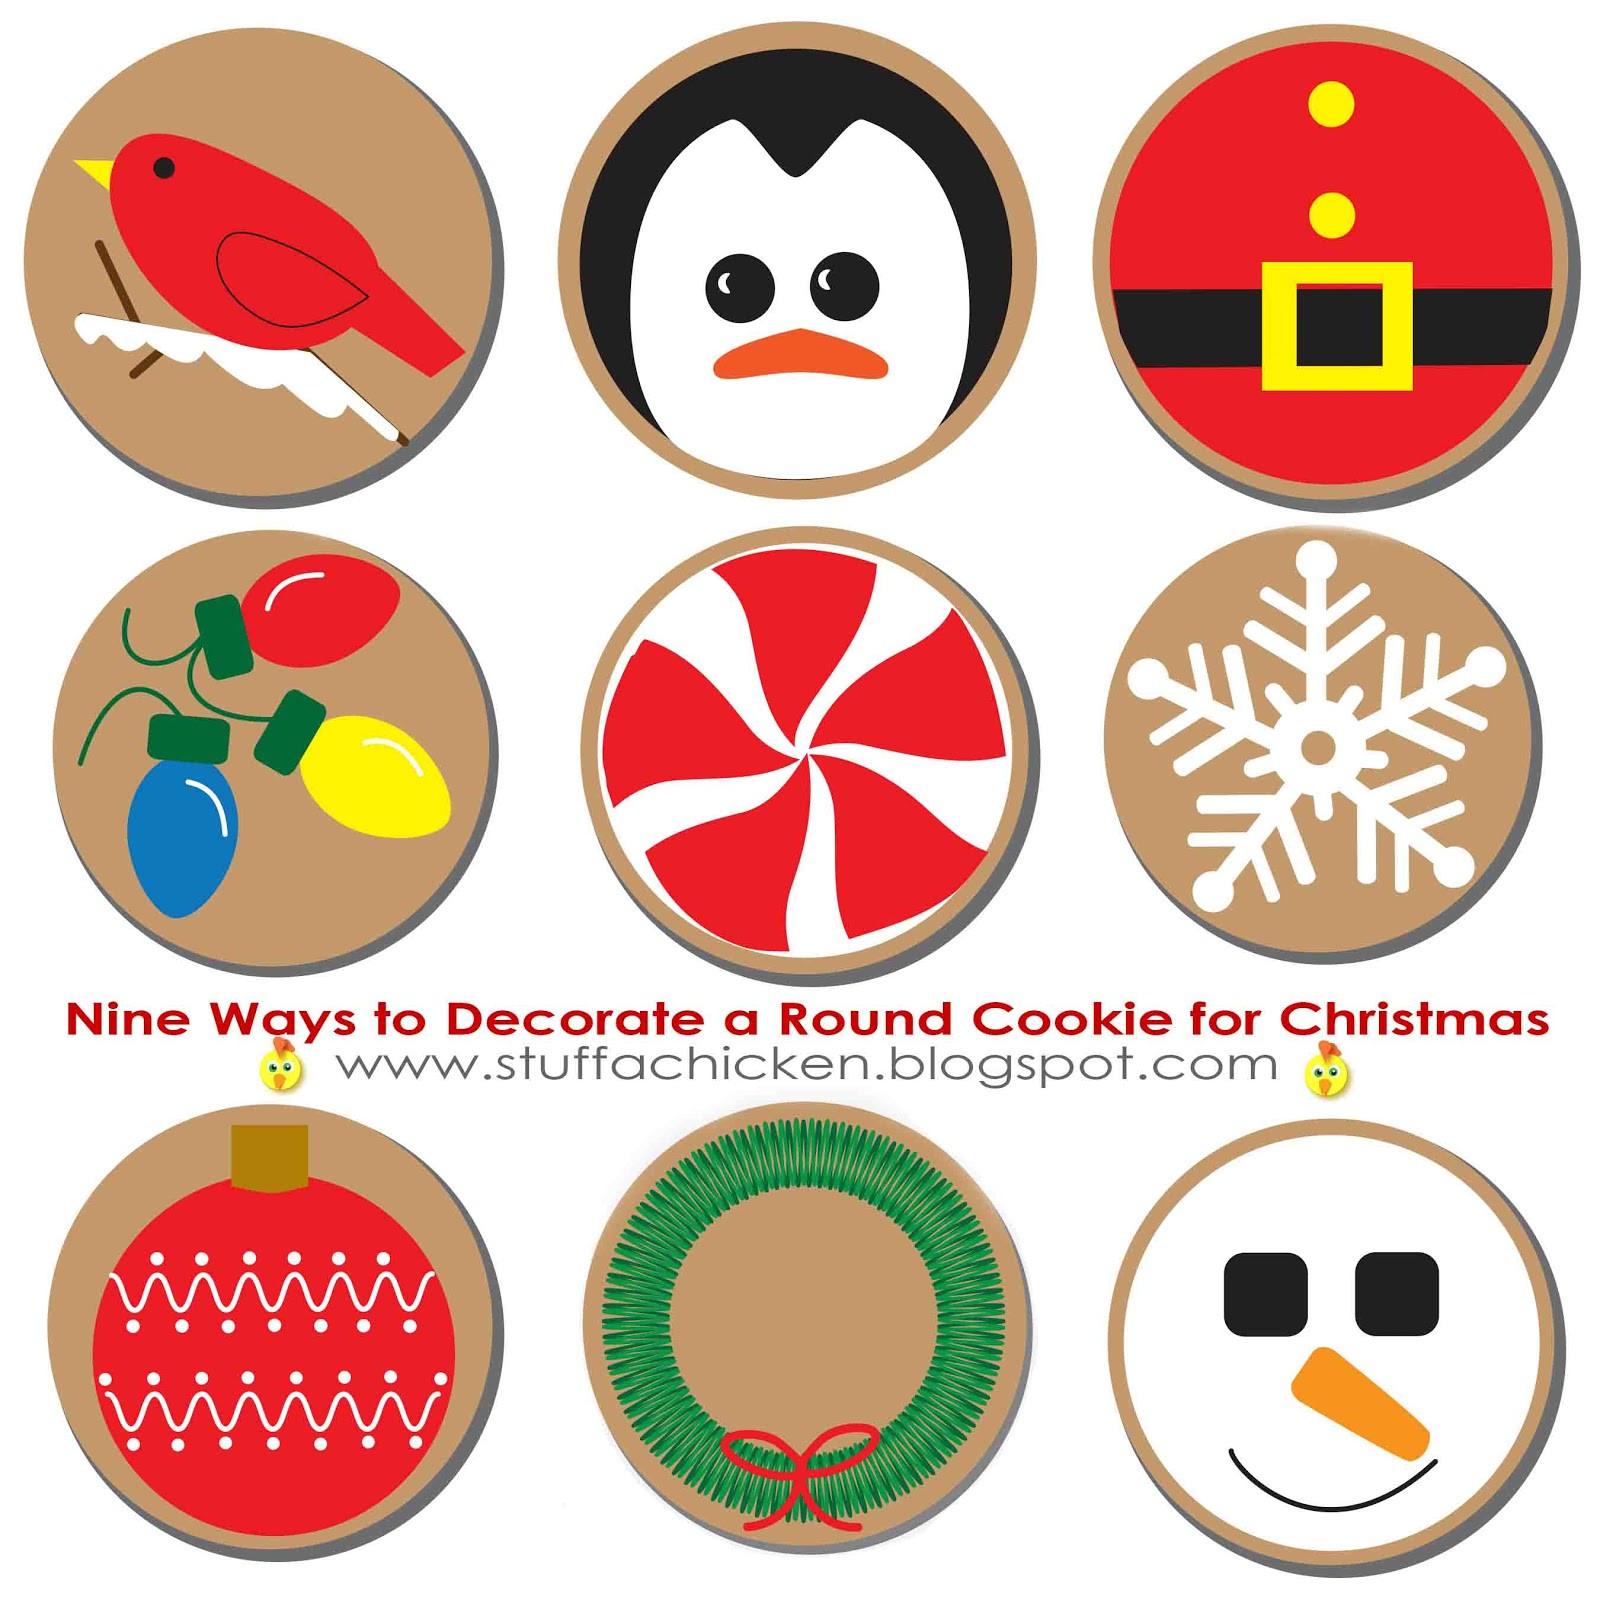 Round Christmas Cookies  Gonna Stuff a Chicken Nine Ways to Decorate a Round